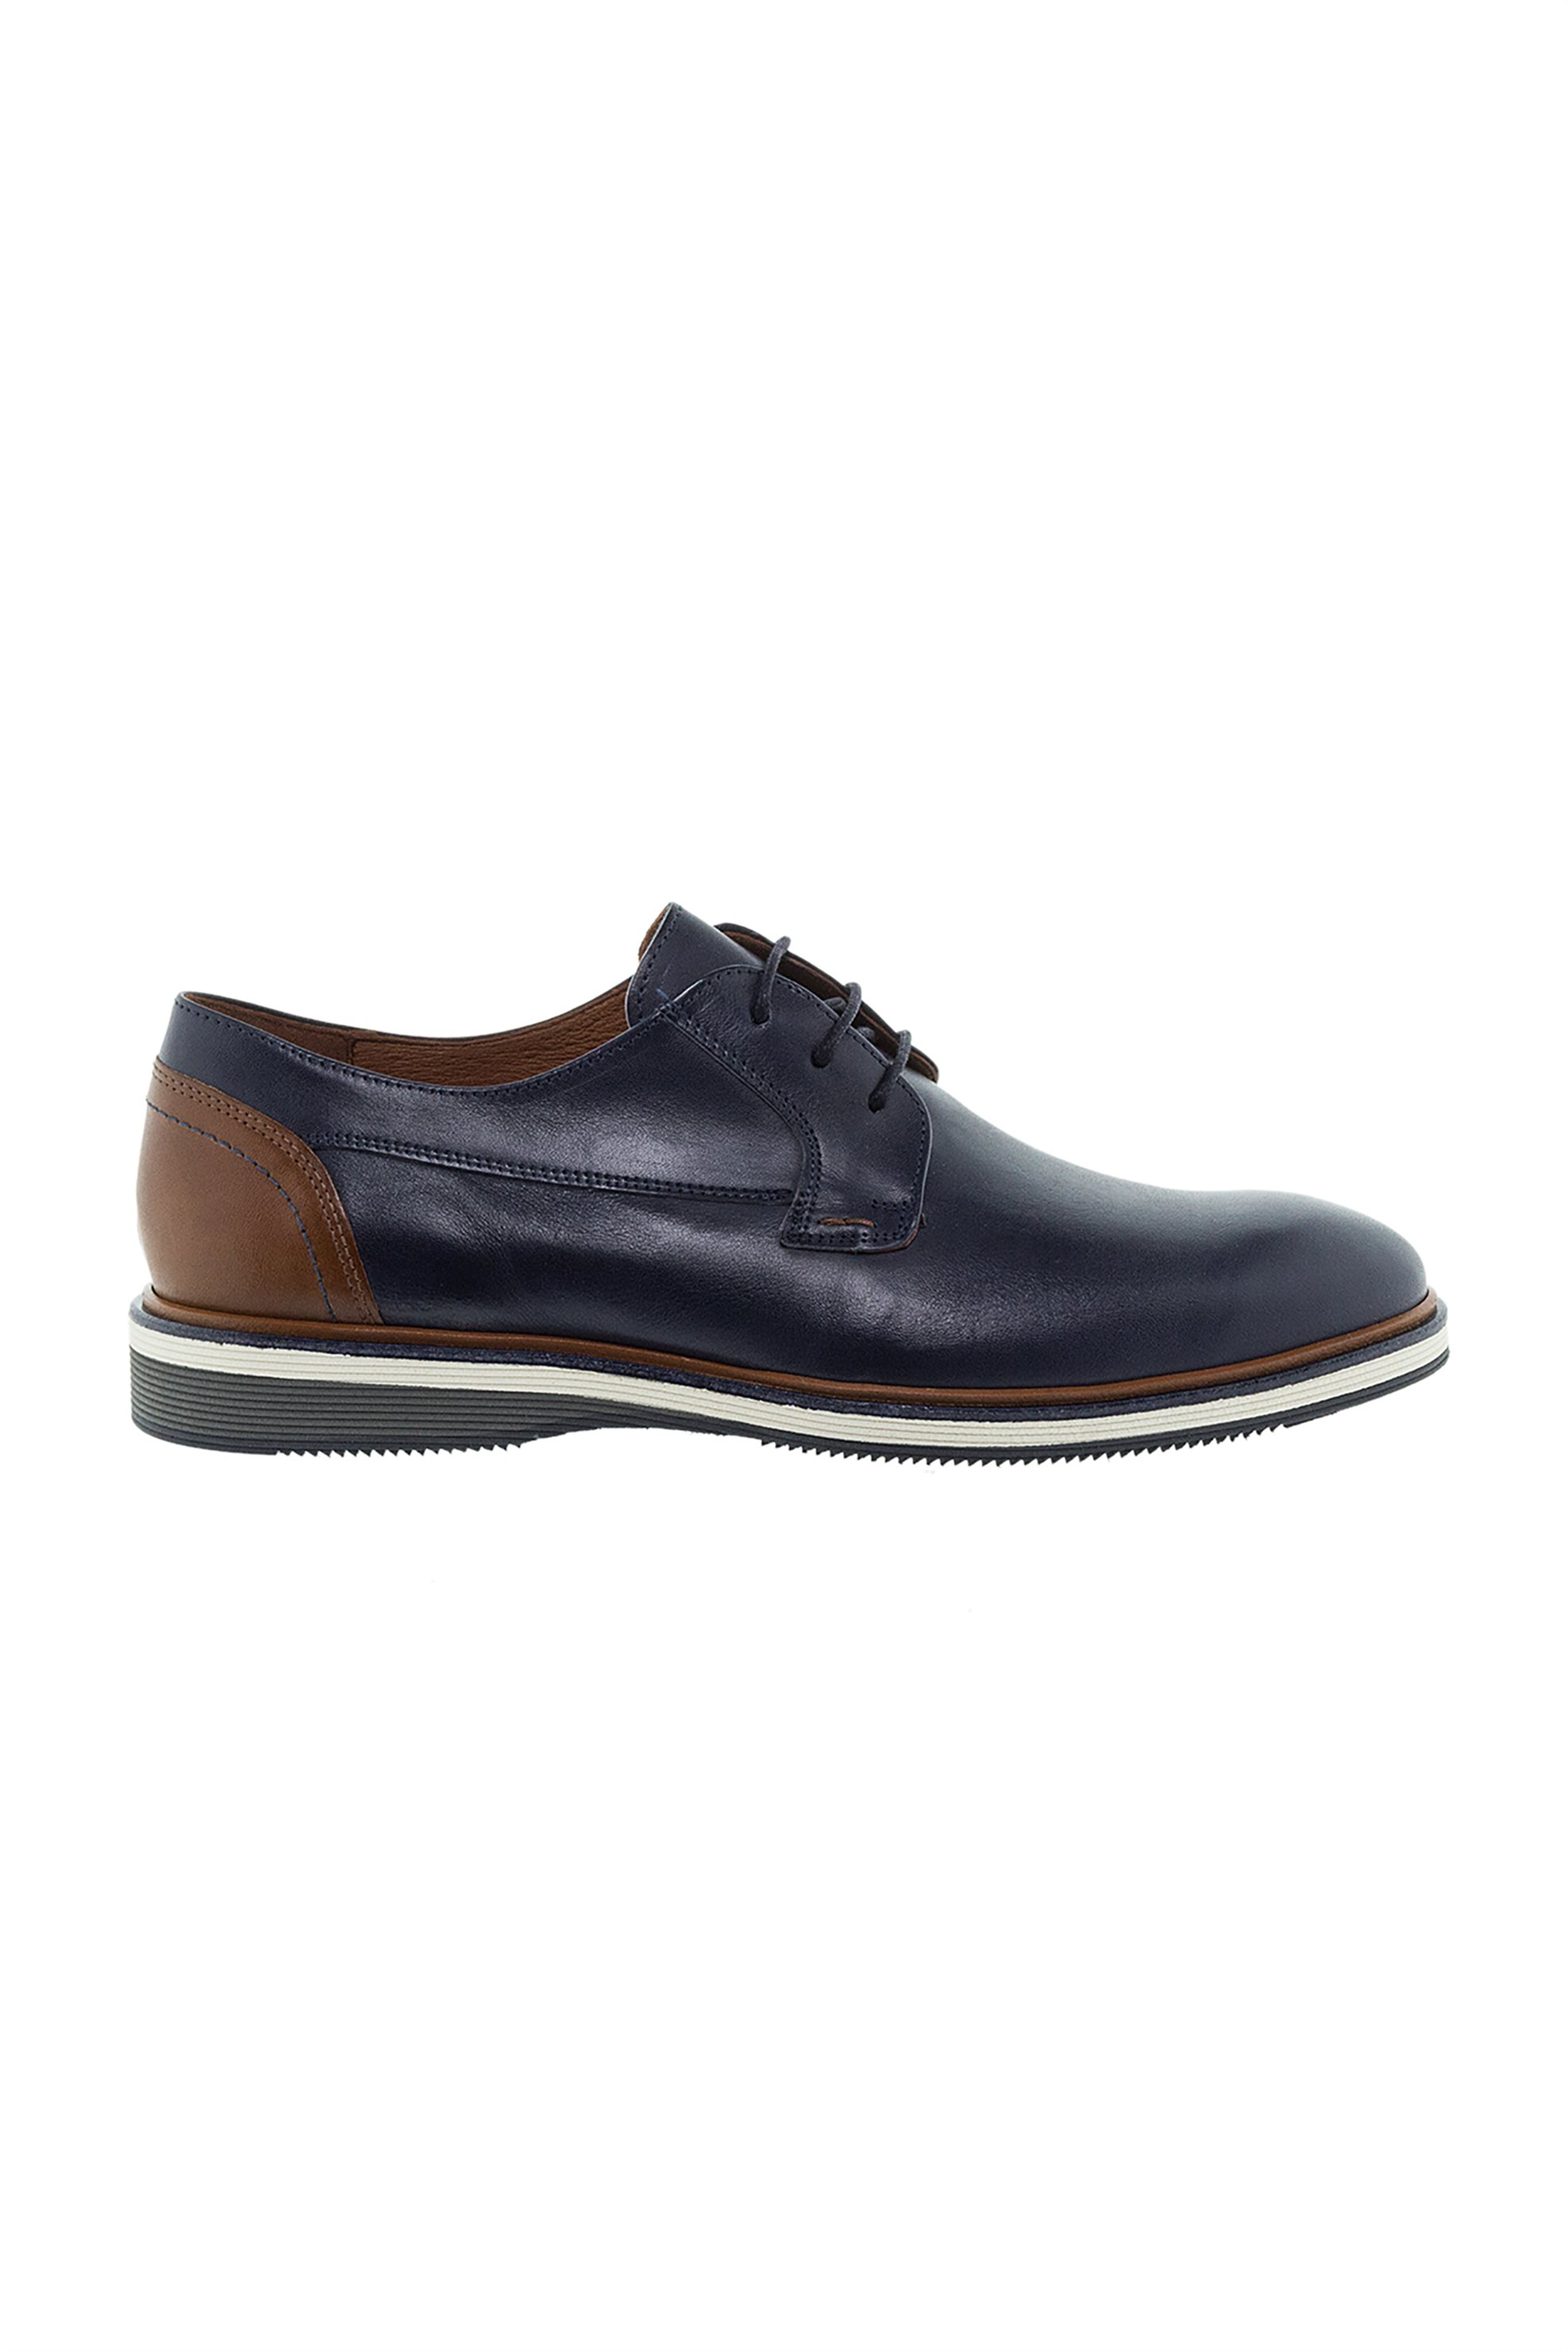 c5dbd63bd31 Παπούτσια DAMIANI - Roe Shoes Collection